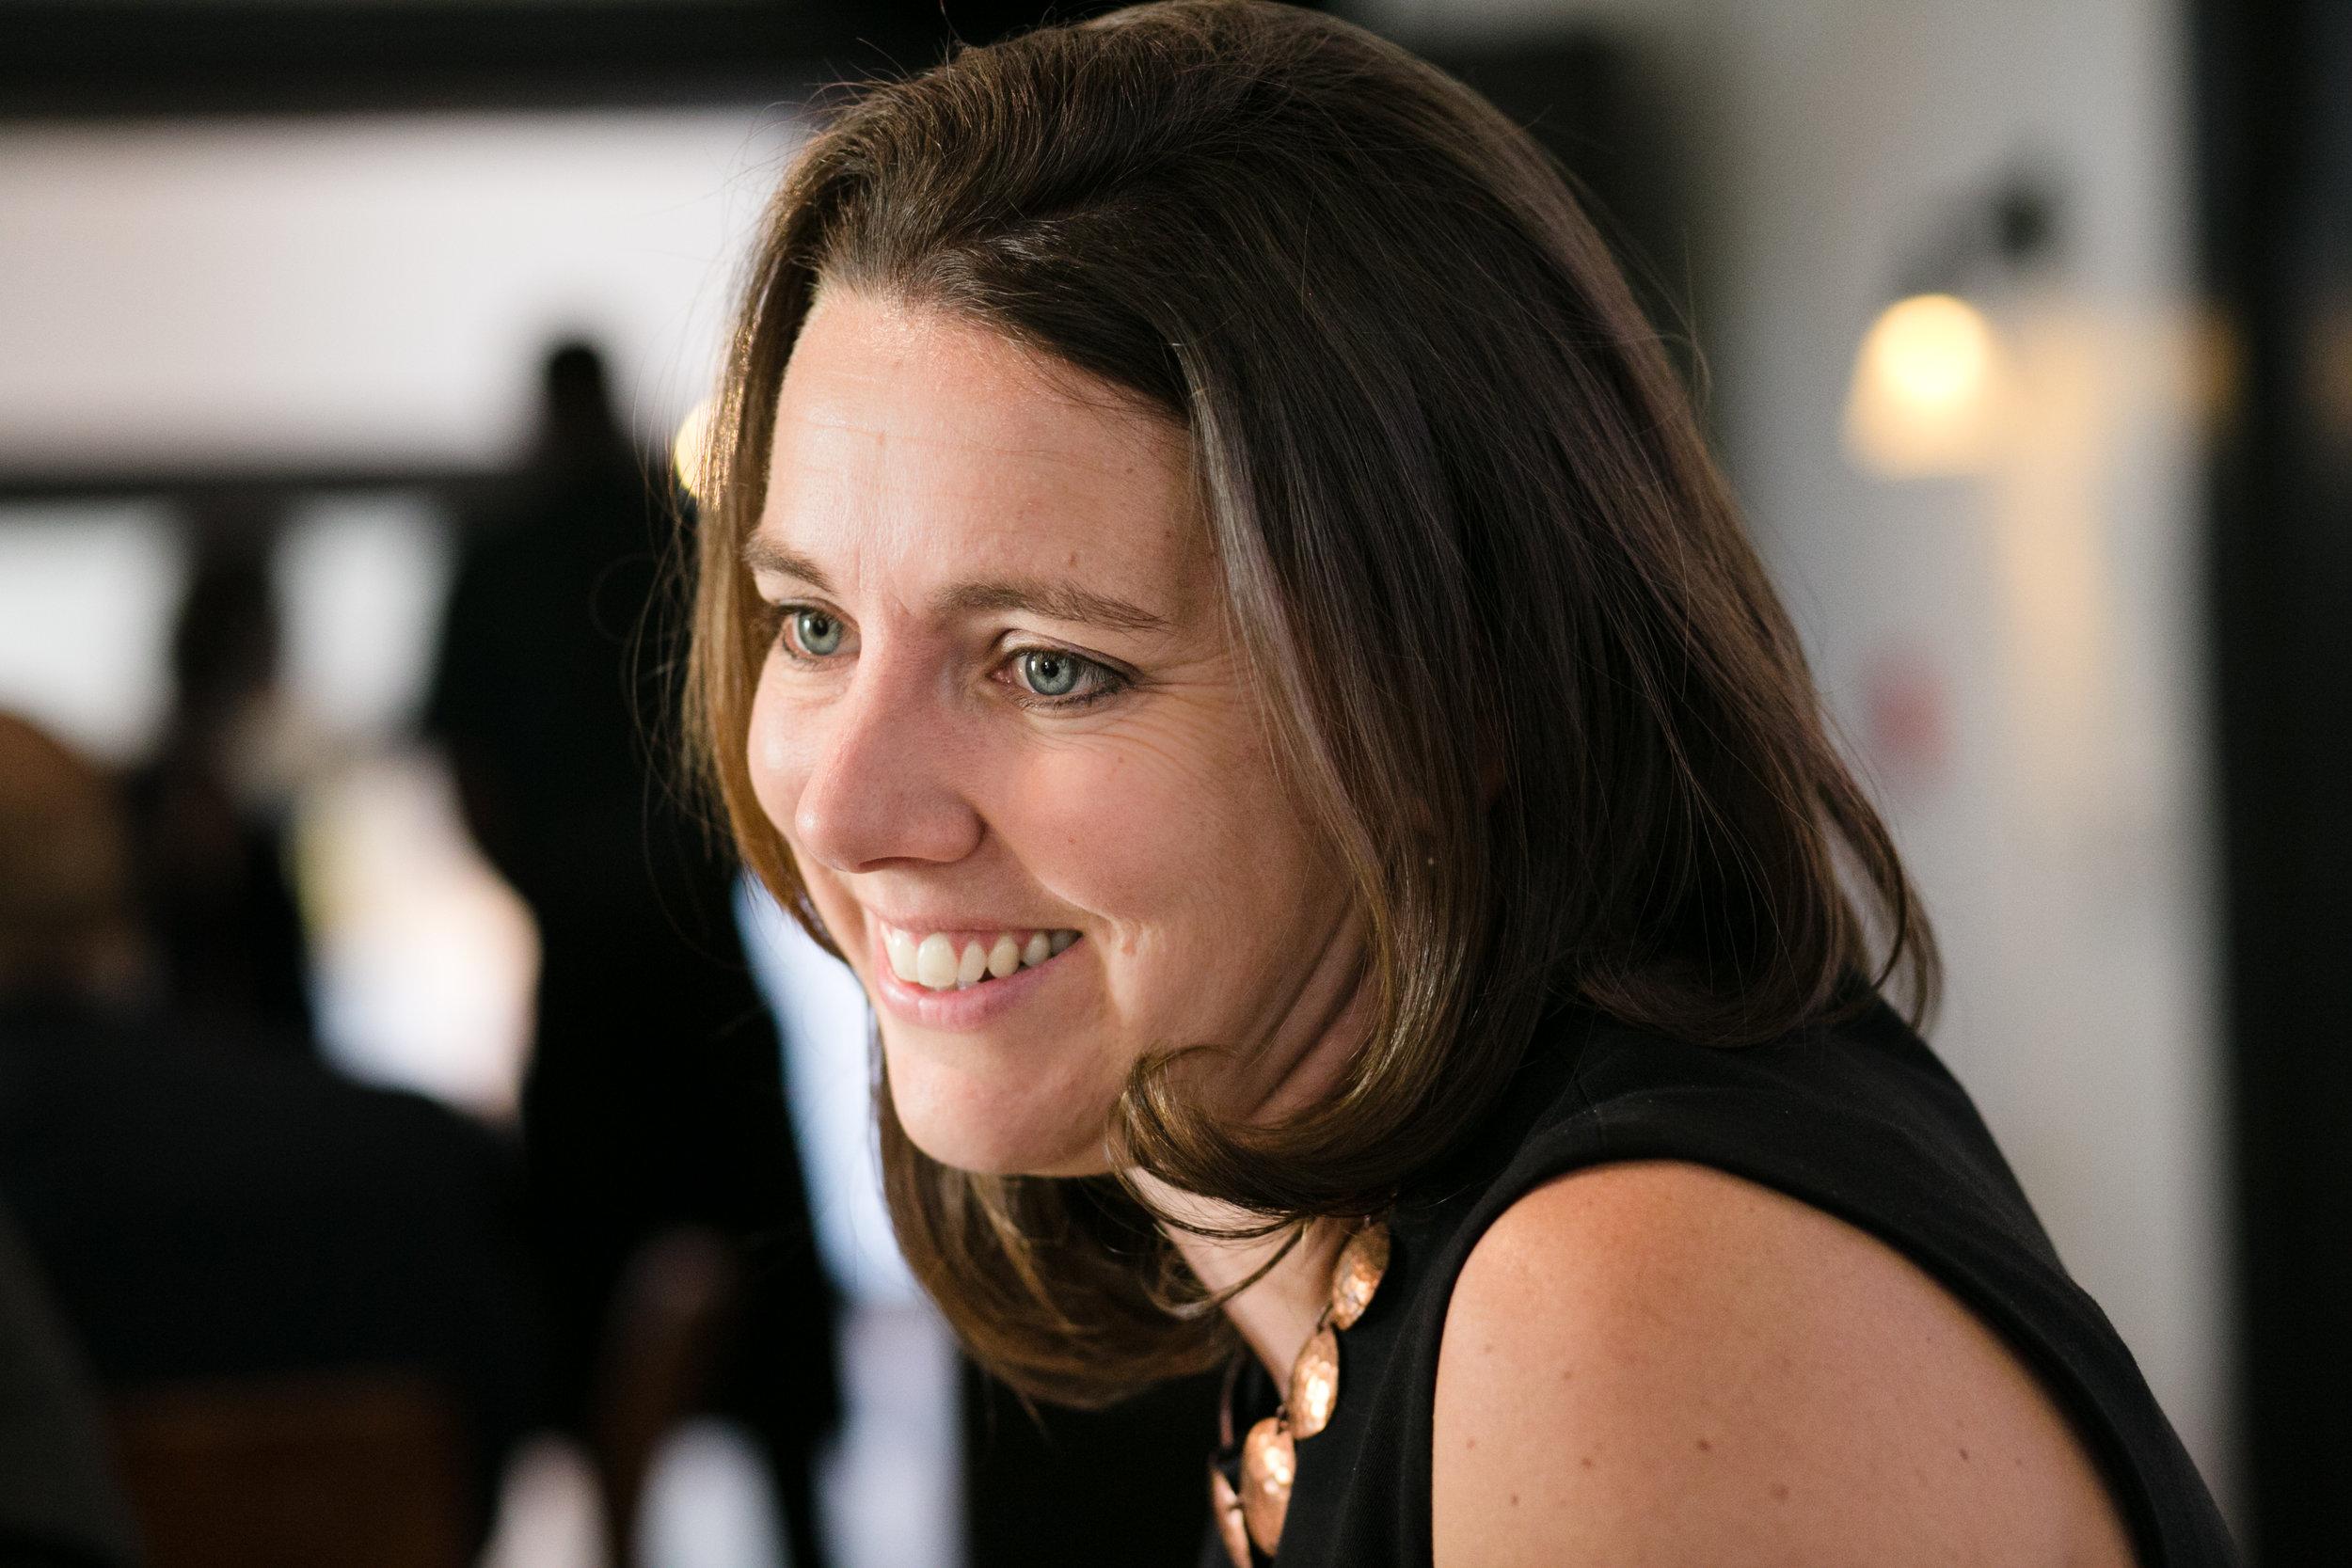 Kelley Maulbetsch*